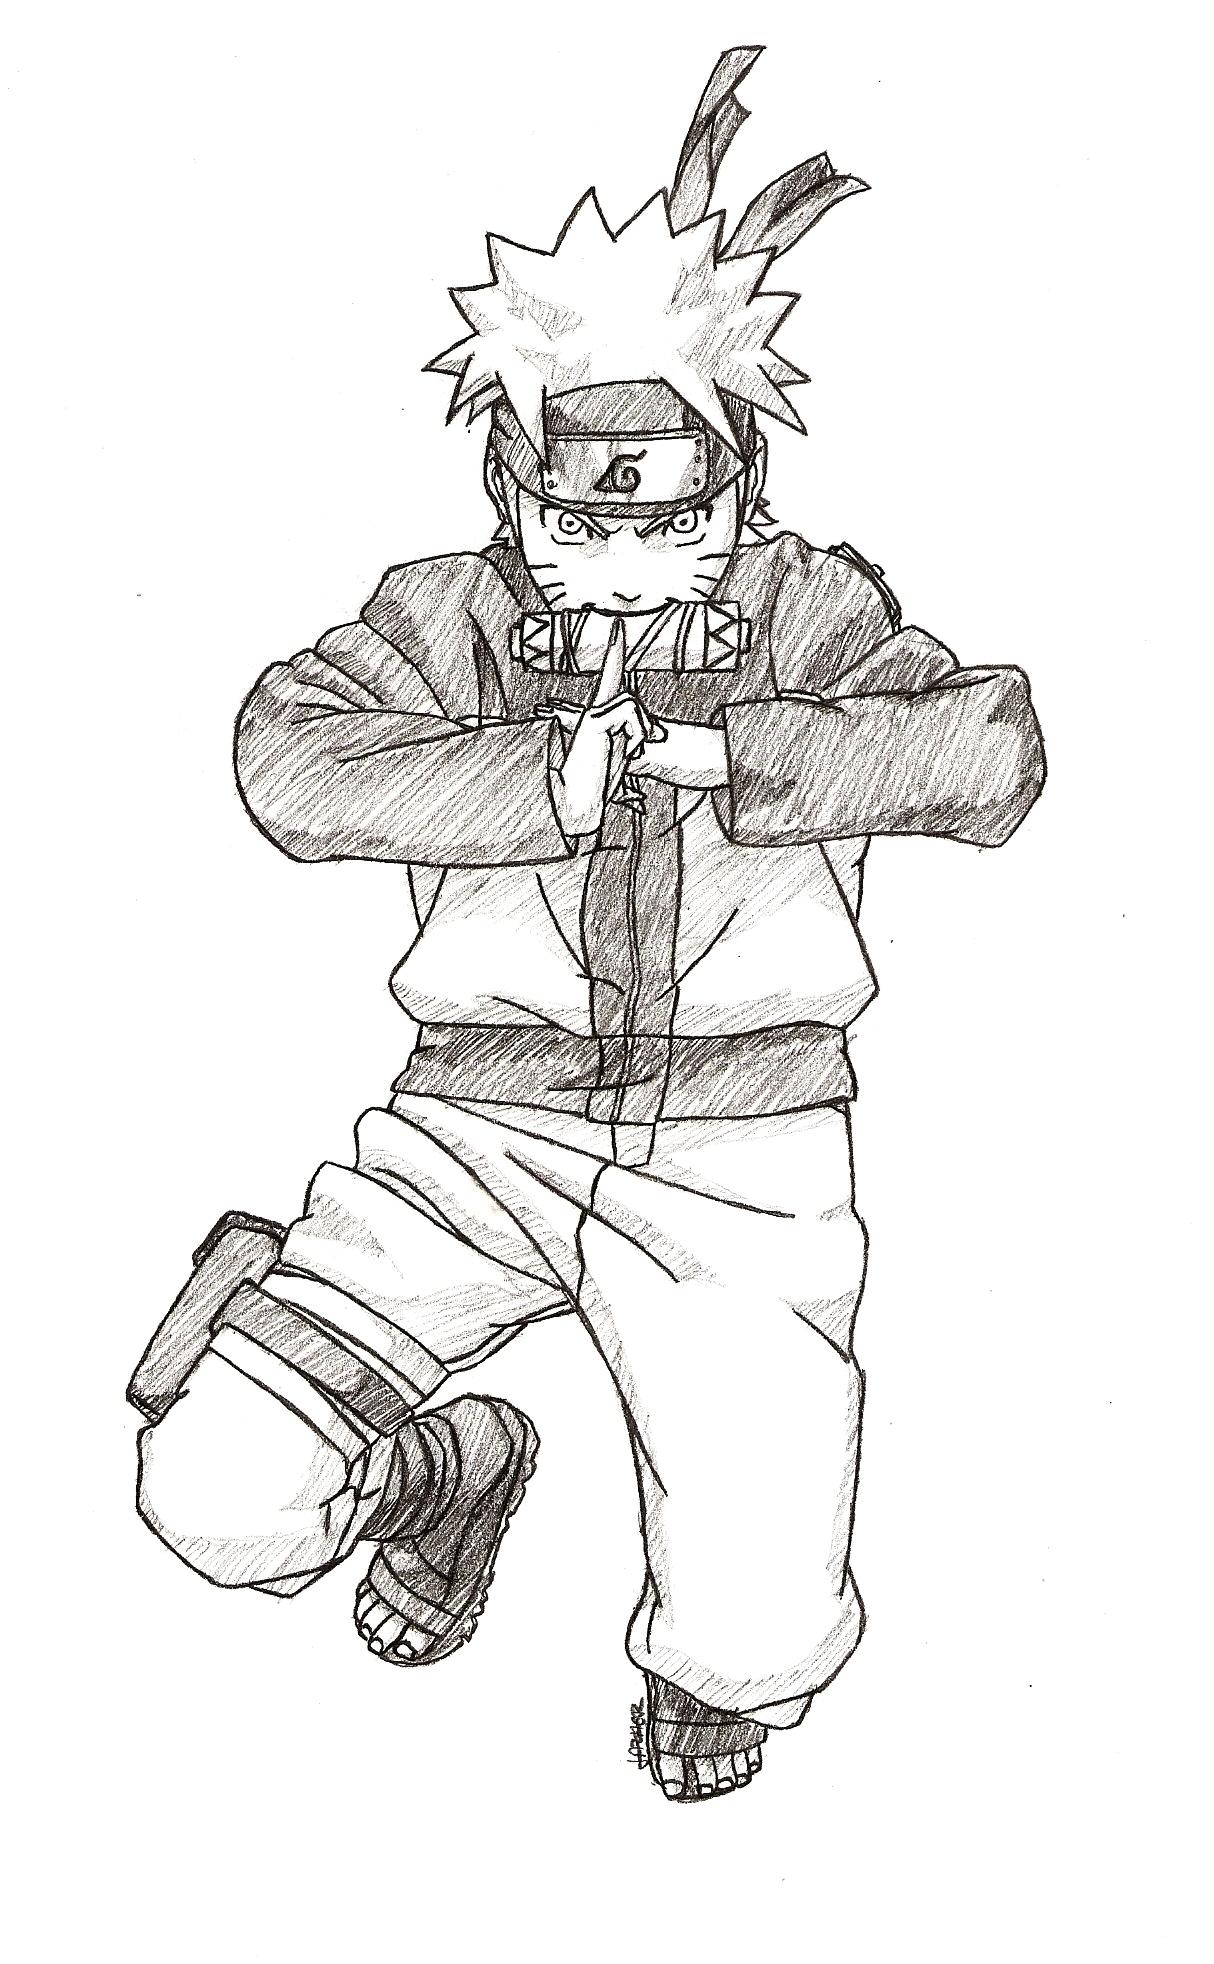 Drawn naruto wallpaper Pencil anime naruto on drawings